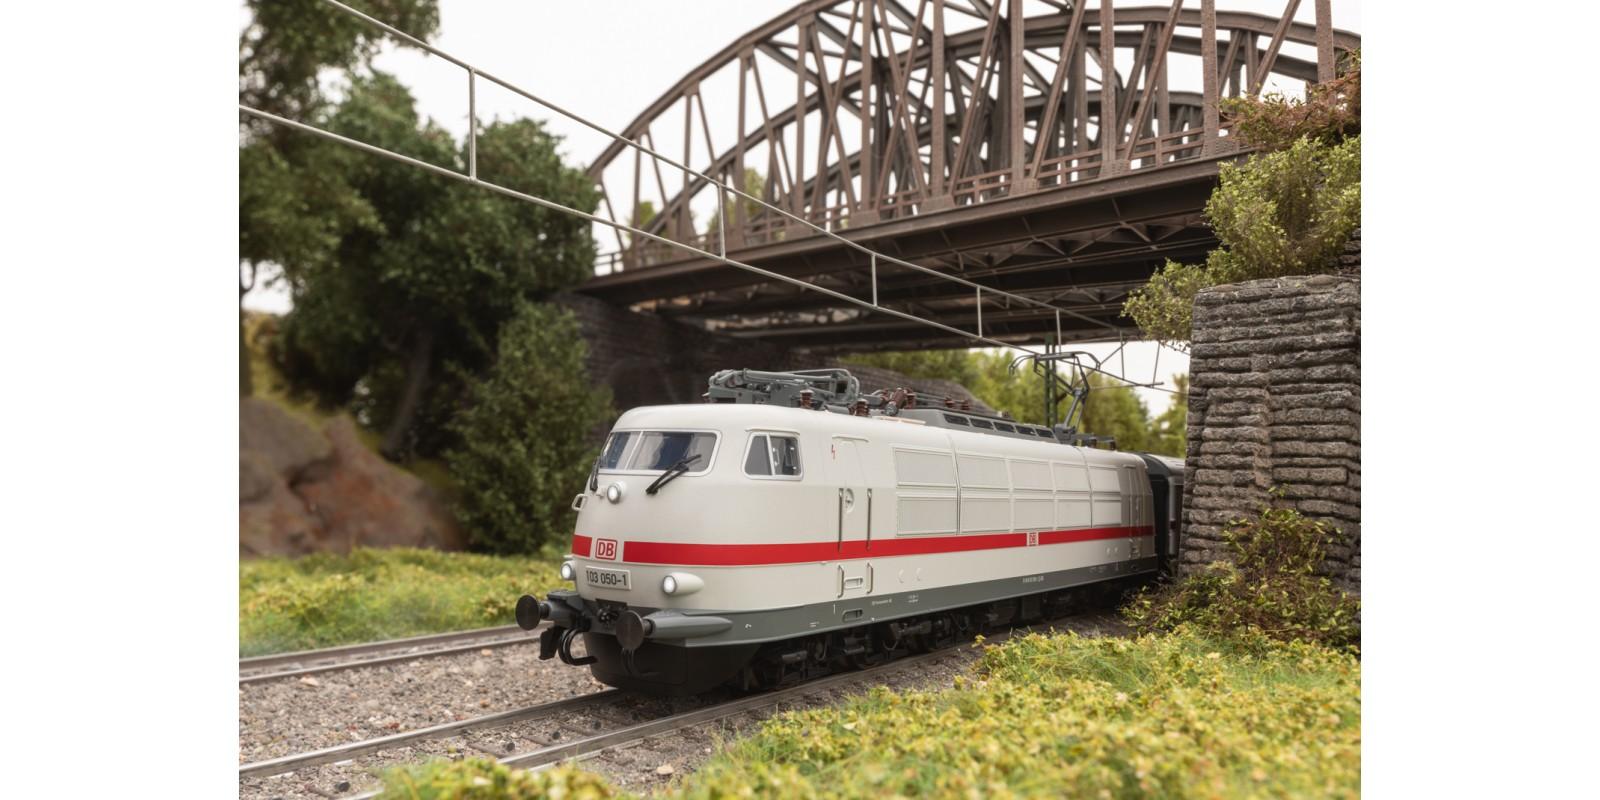 39173 Class 103.1 Electric Locomoti